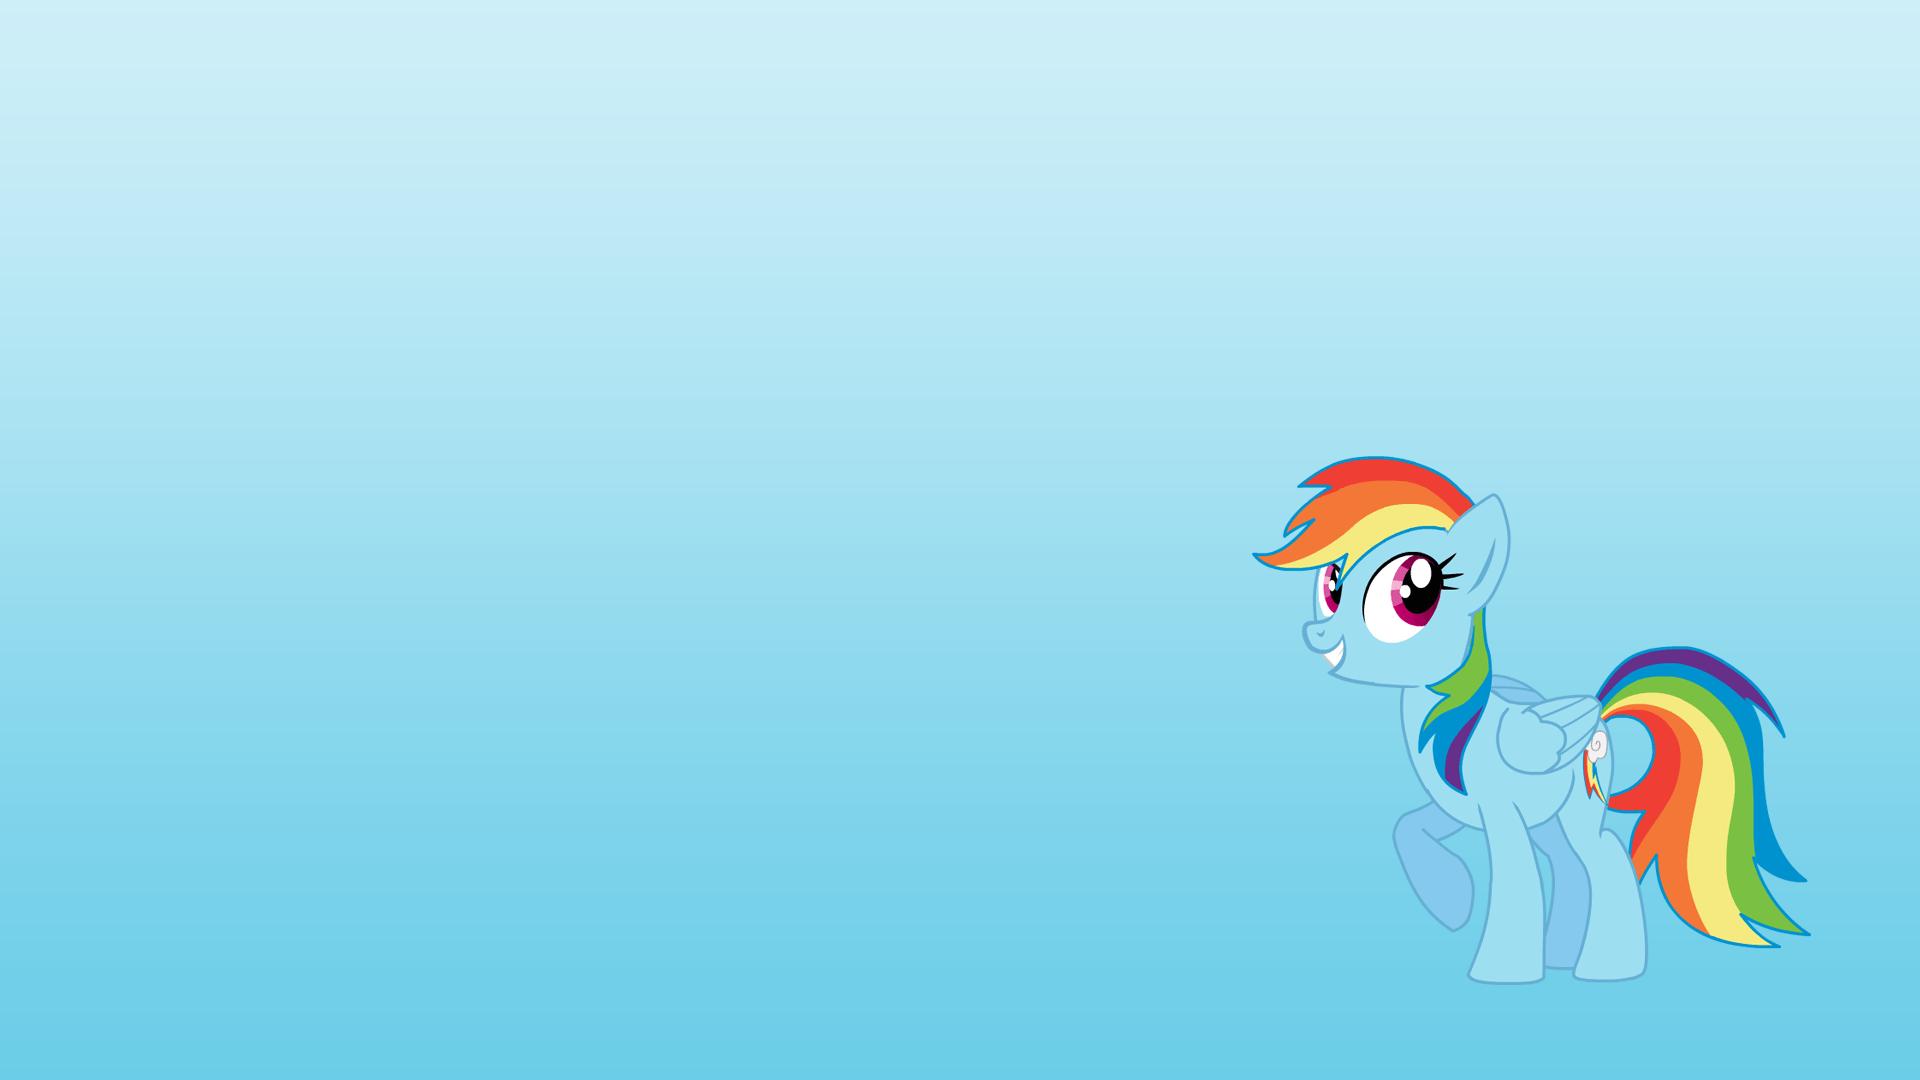 phoenix wallpaper pony little - photo #25